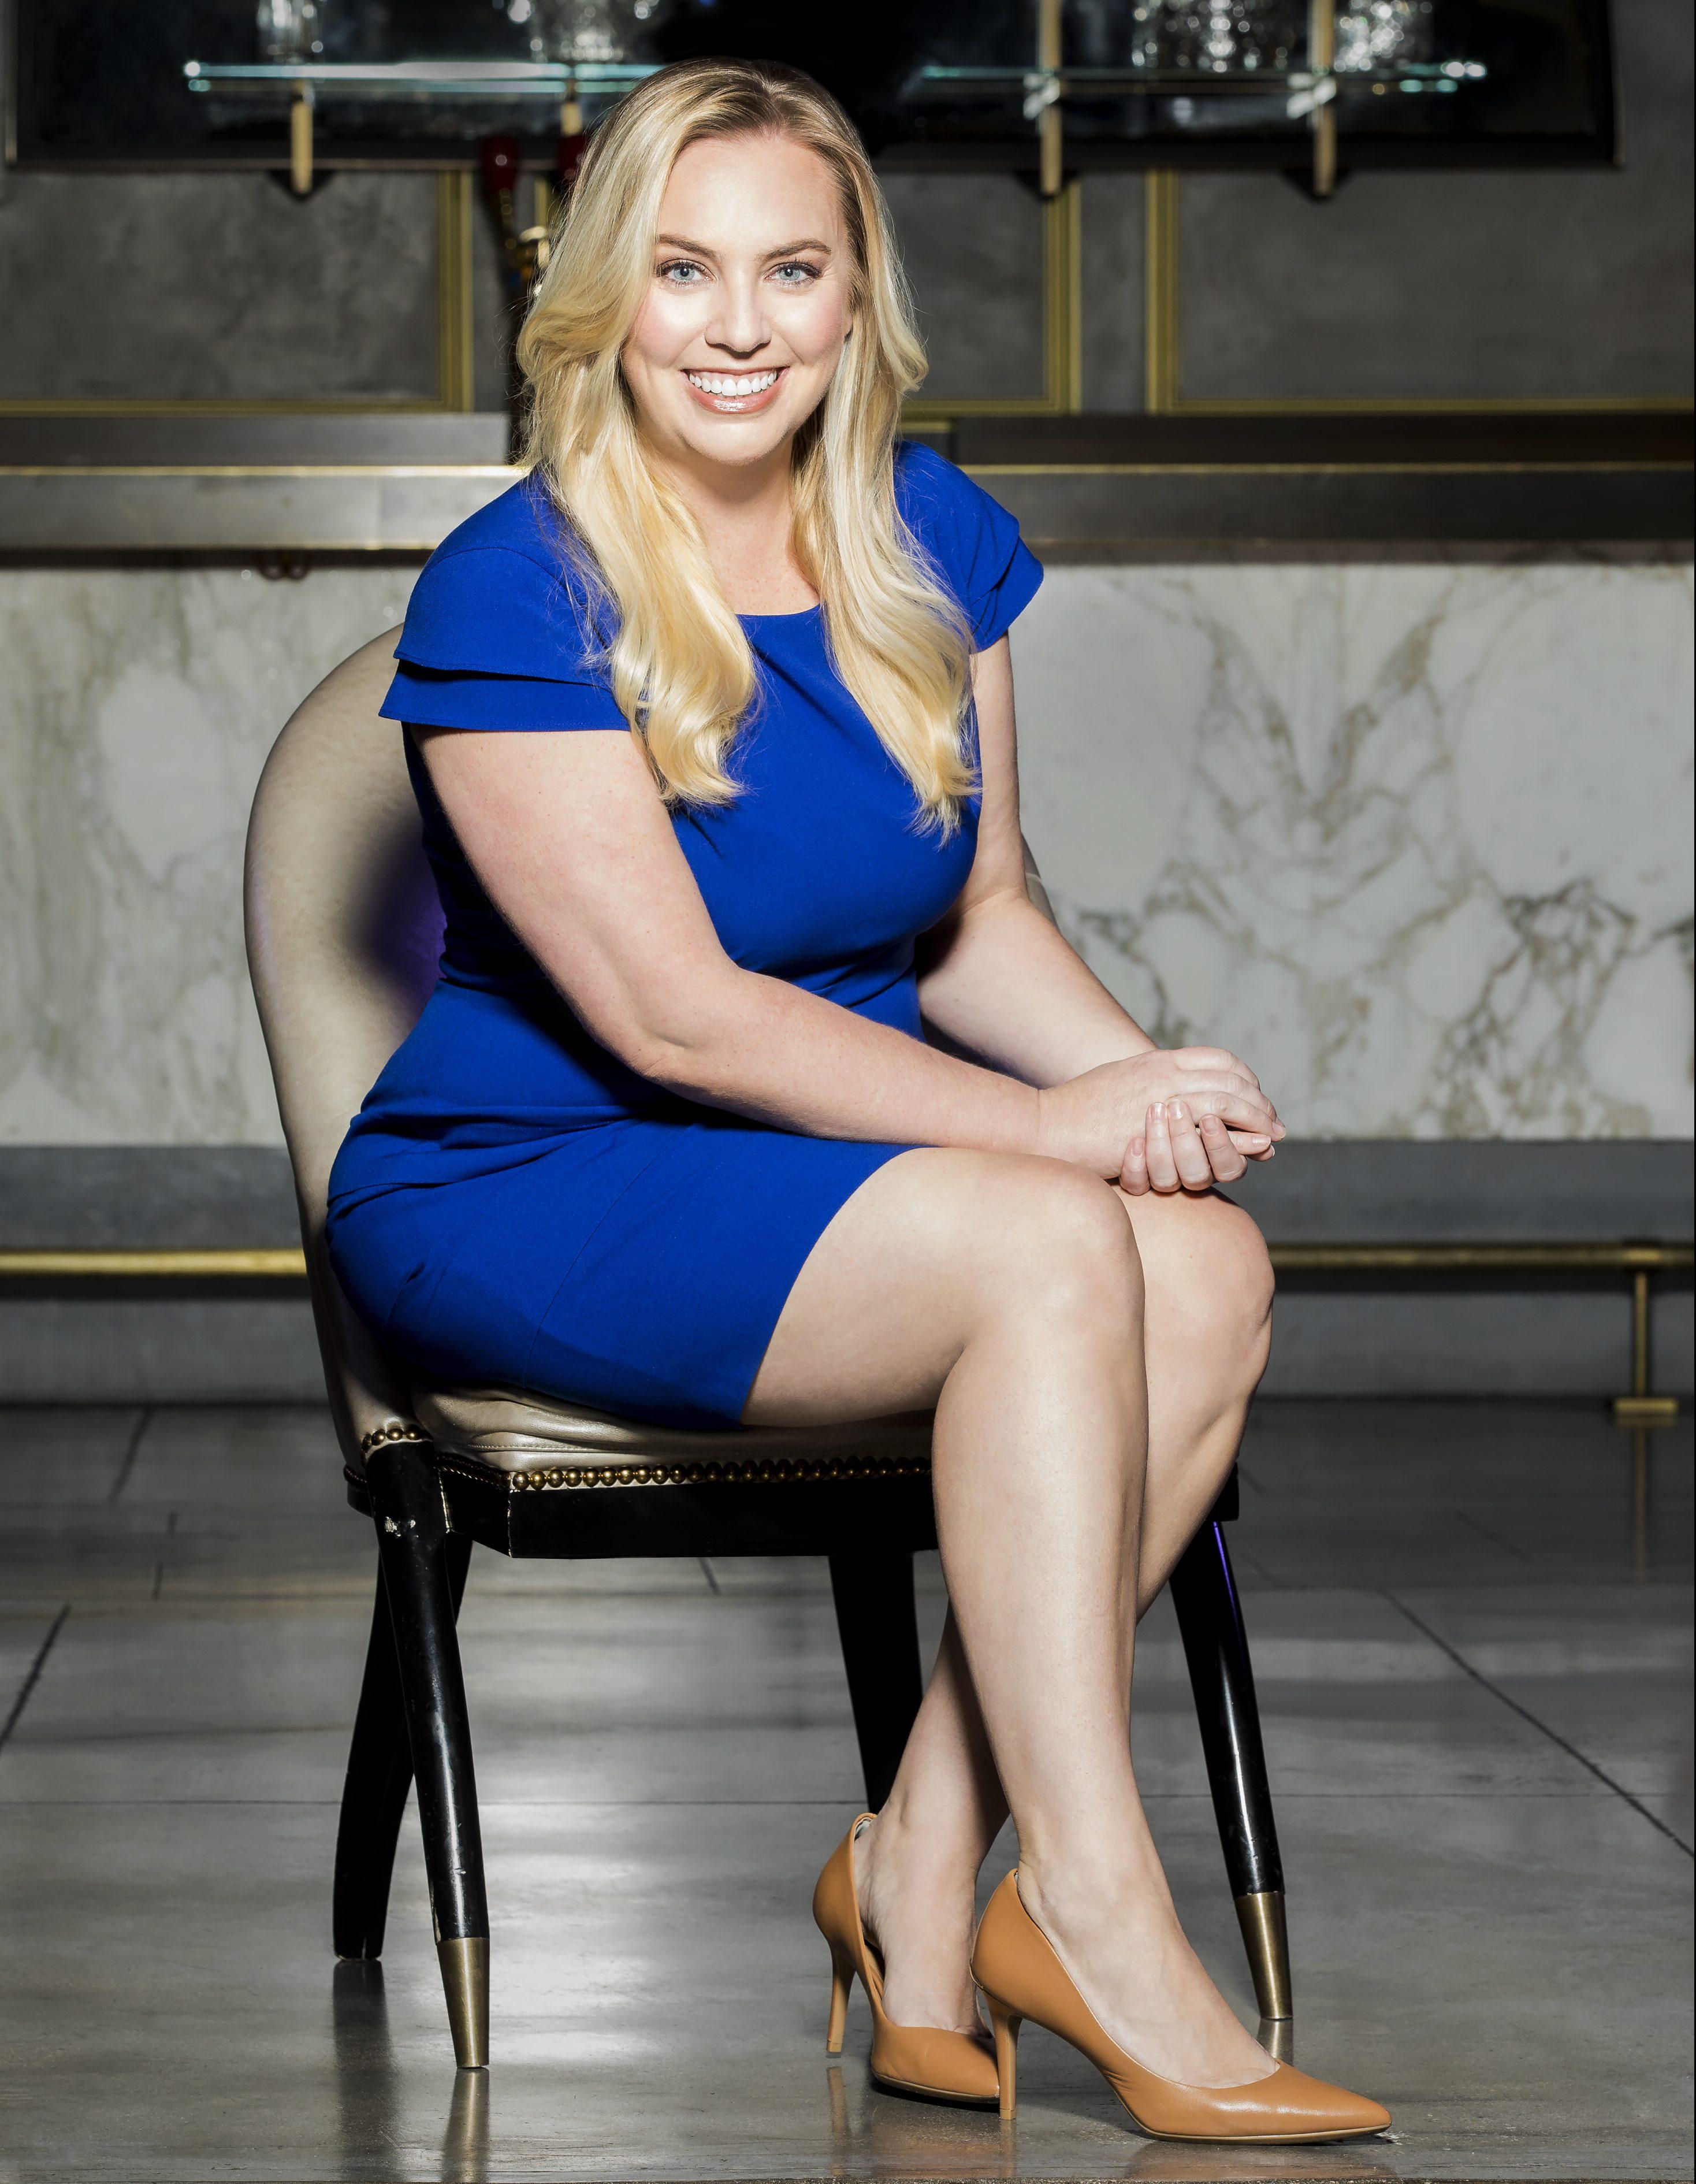 Chef Concierge Angela Cooper